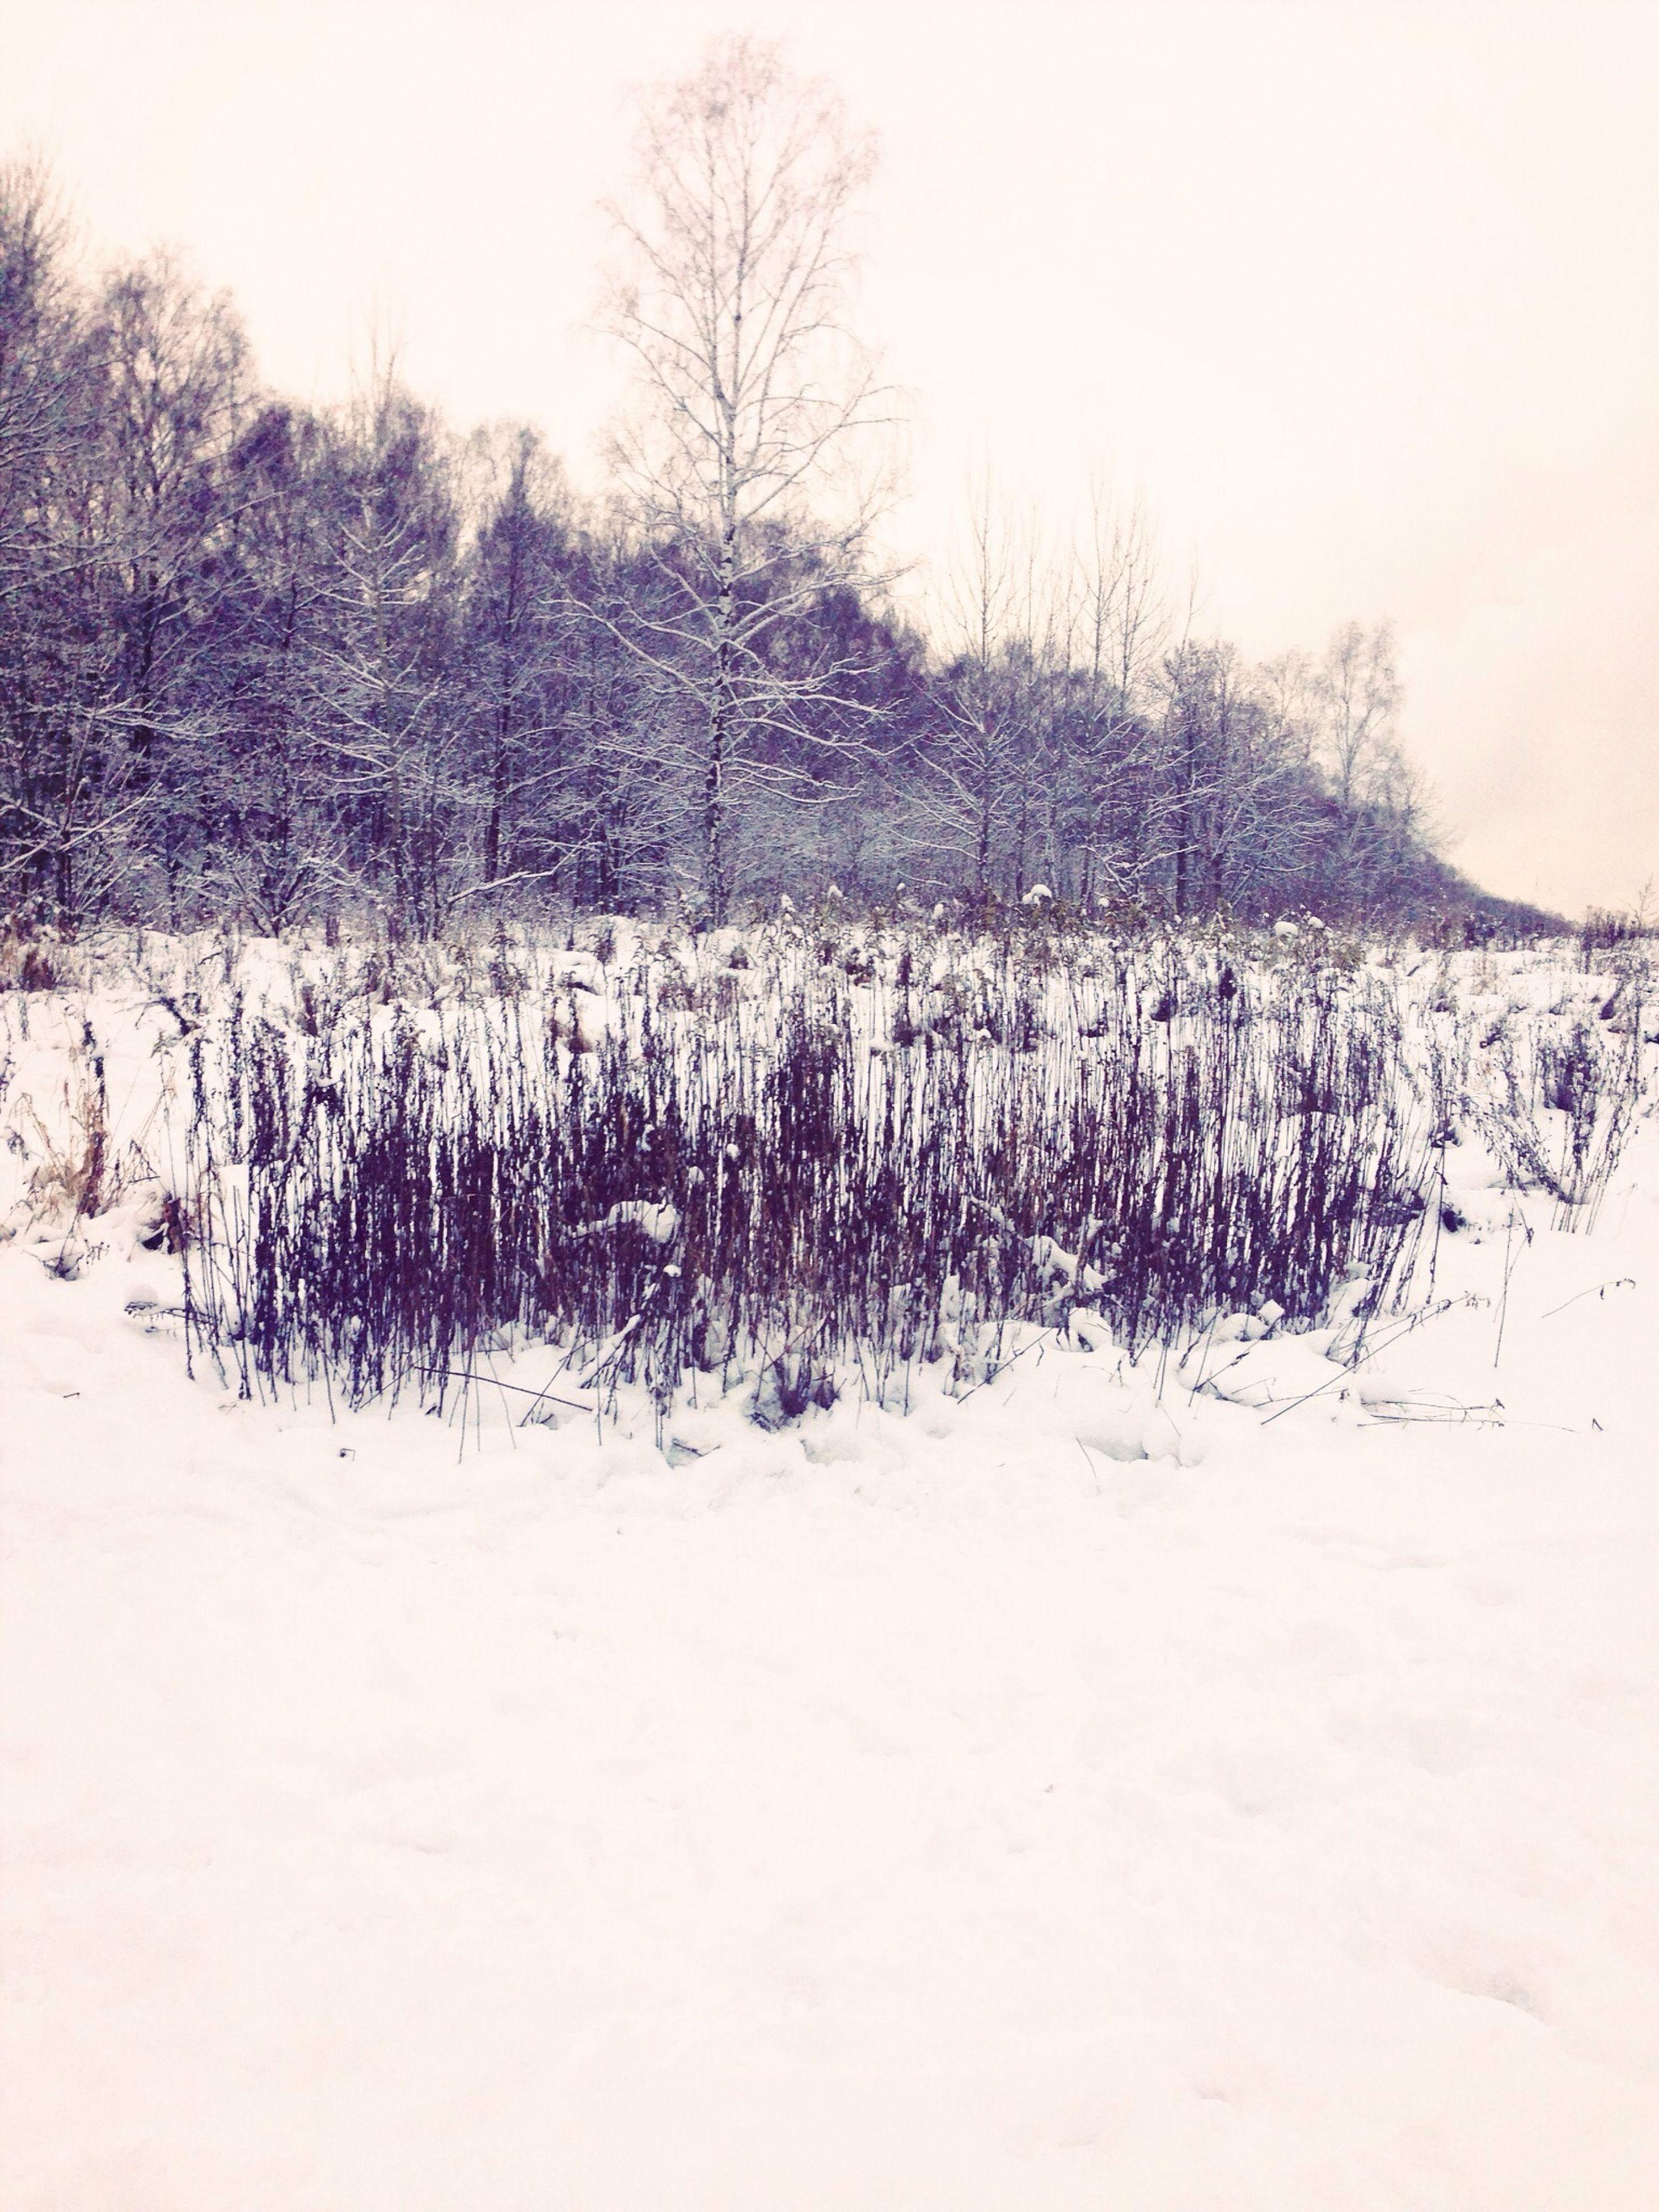 snow, winter, cold temperature, bare tree, clear sky, tranquility, tranquil scene, tree, season, landscape, weather, nature, field, beauty in nature, white color, covering, scenics, frozen, non-urban scene, sky